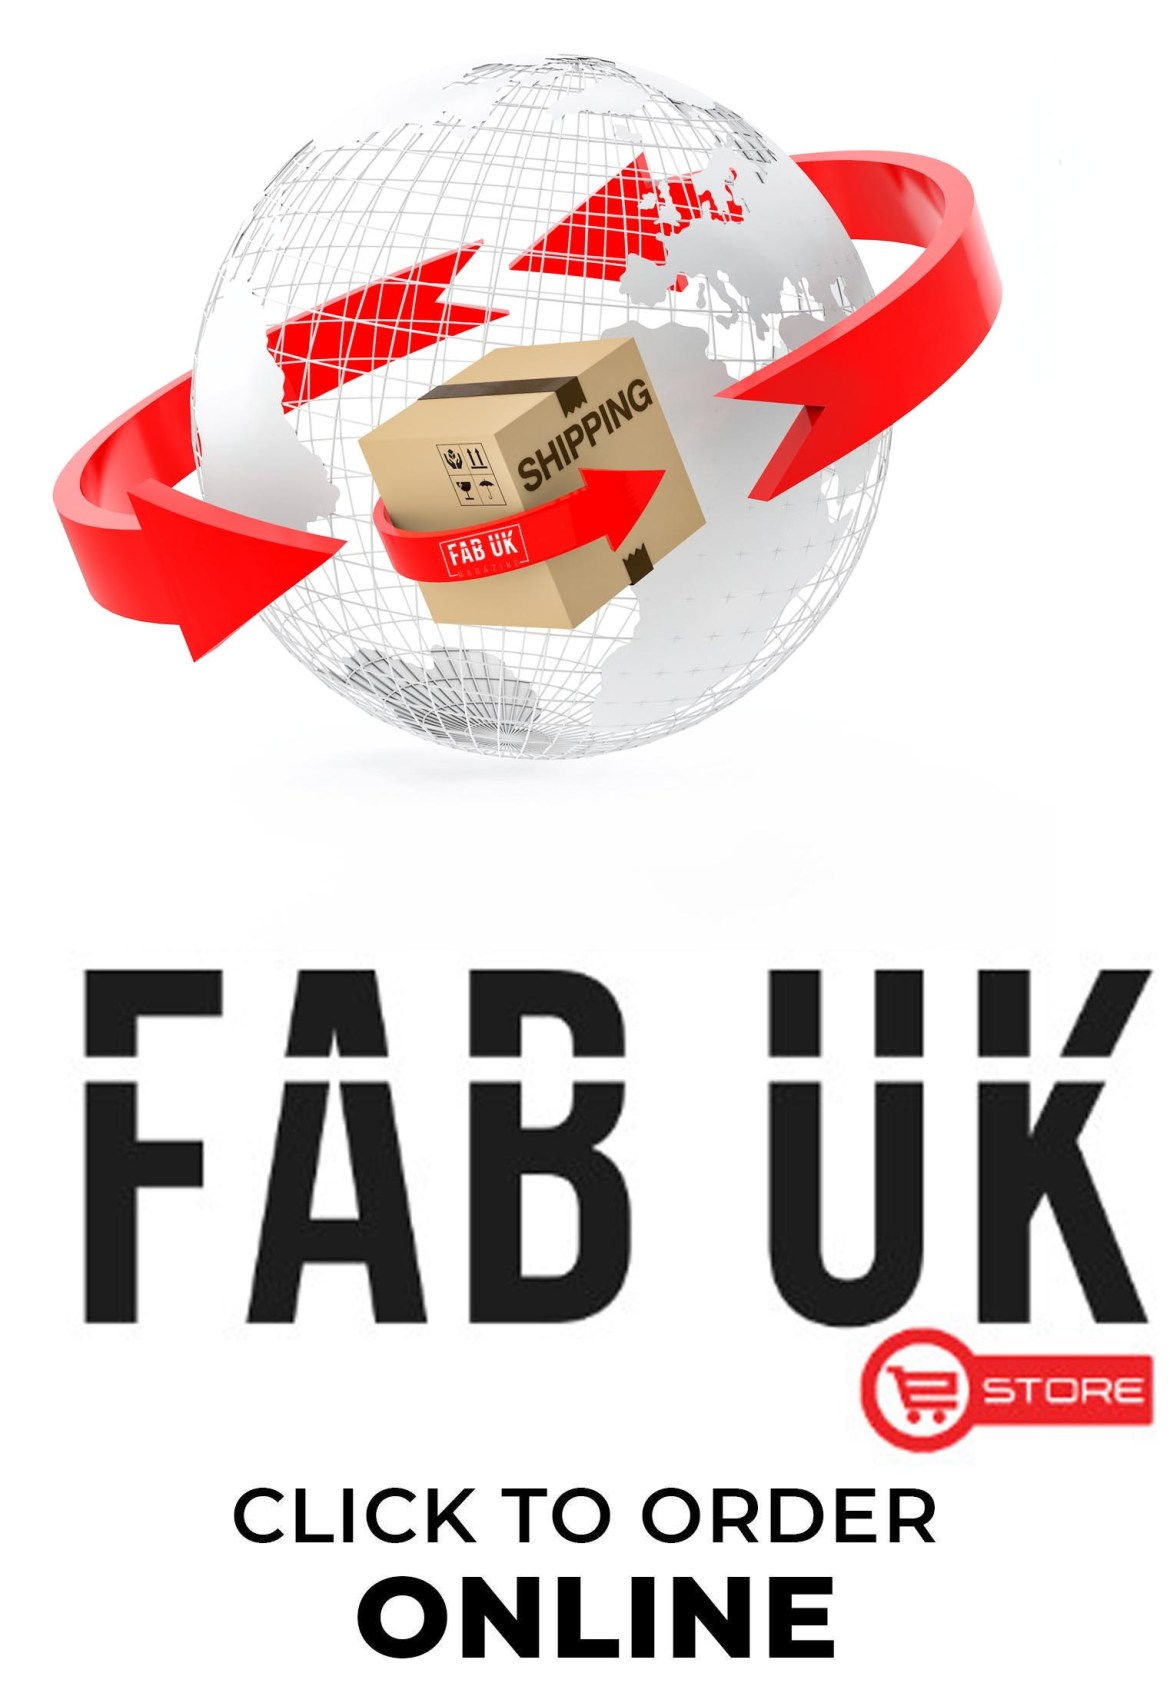 Get fabuk magazine worldwide online